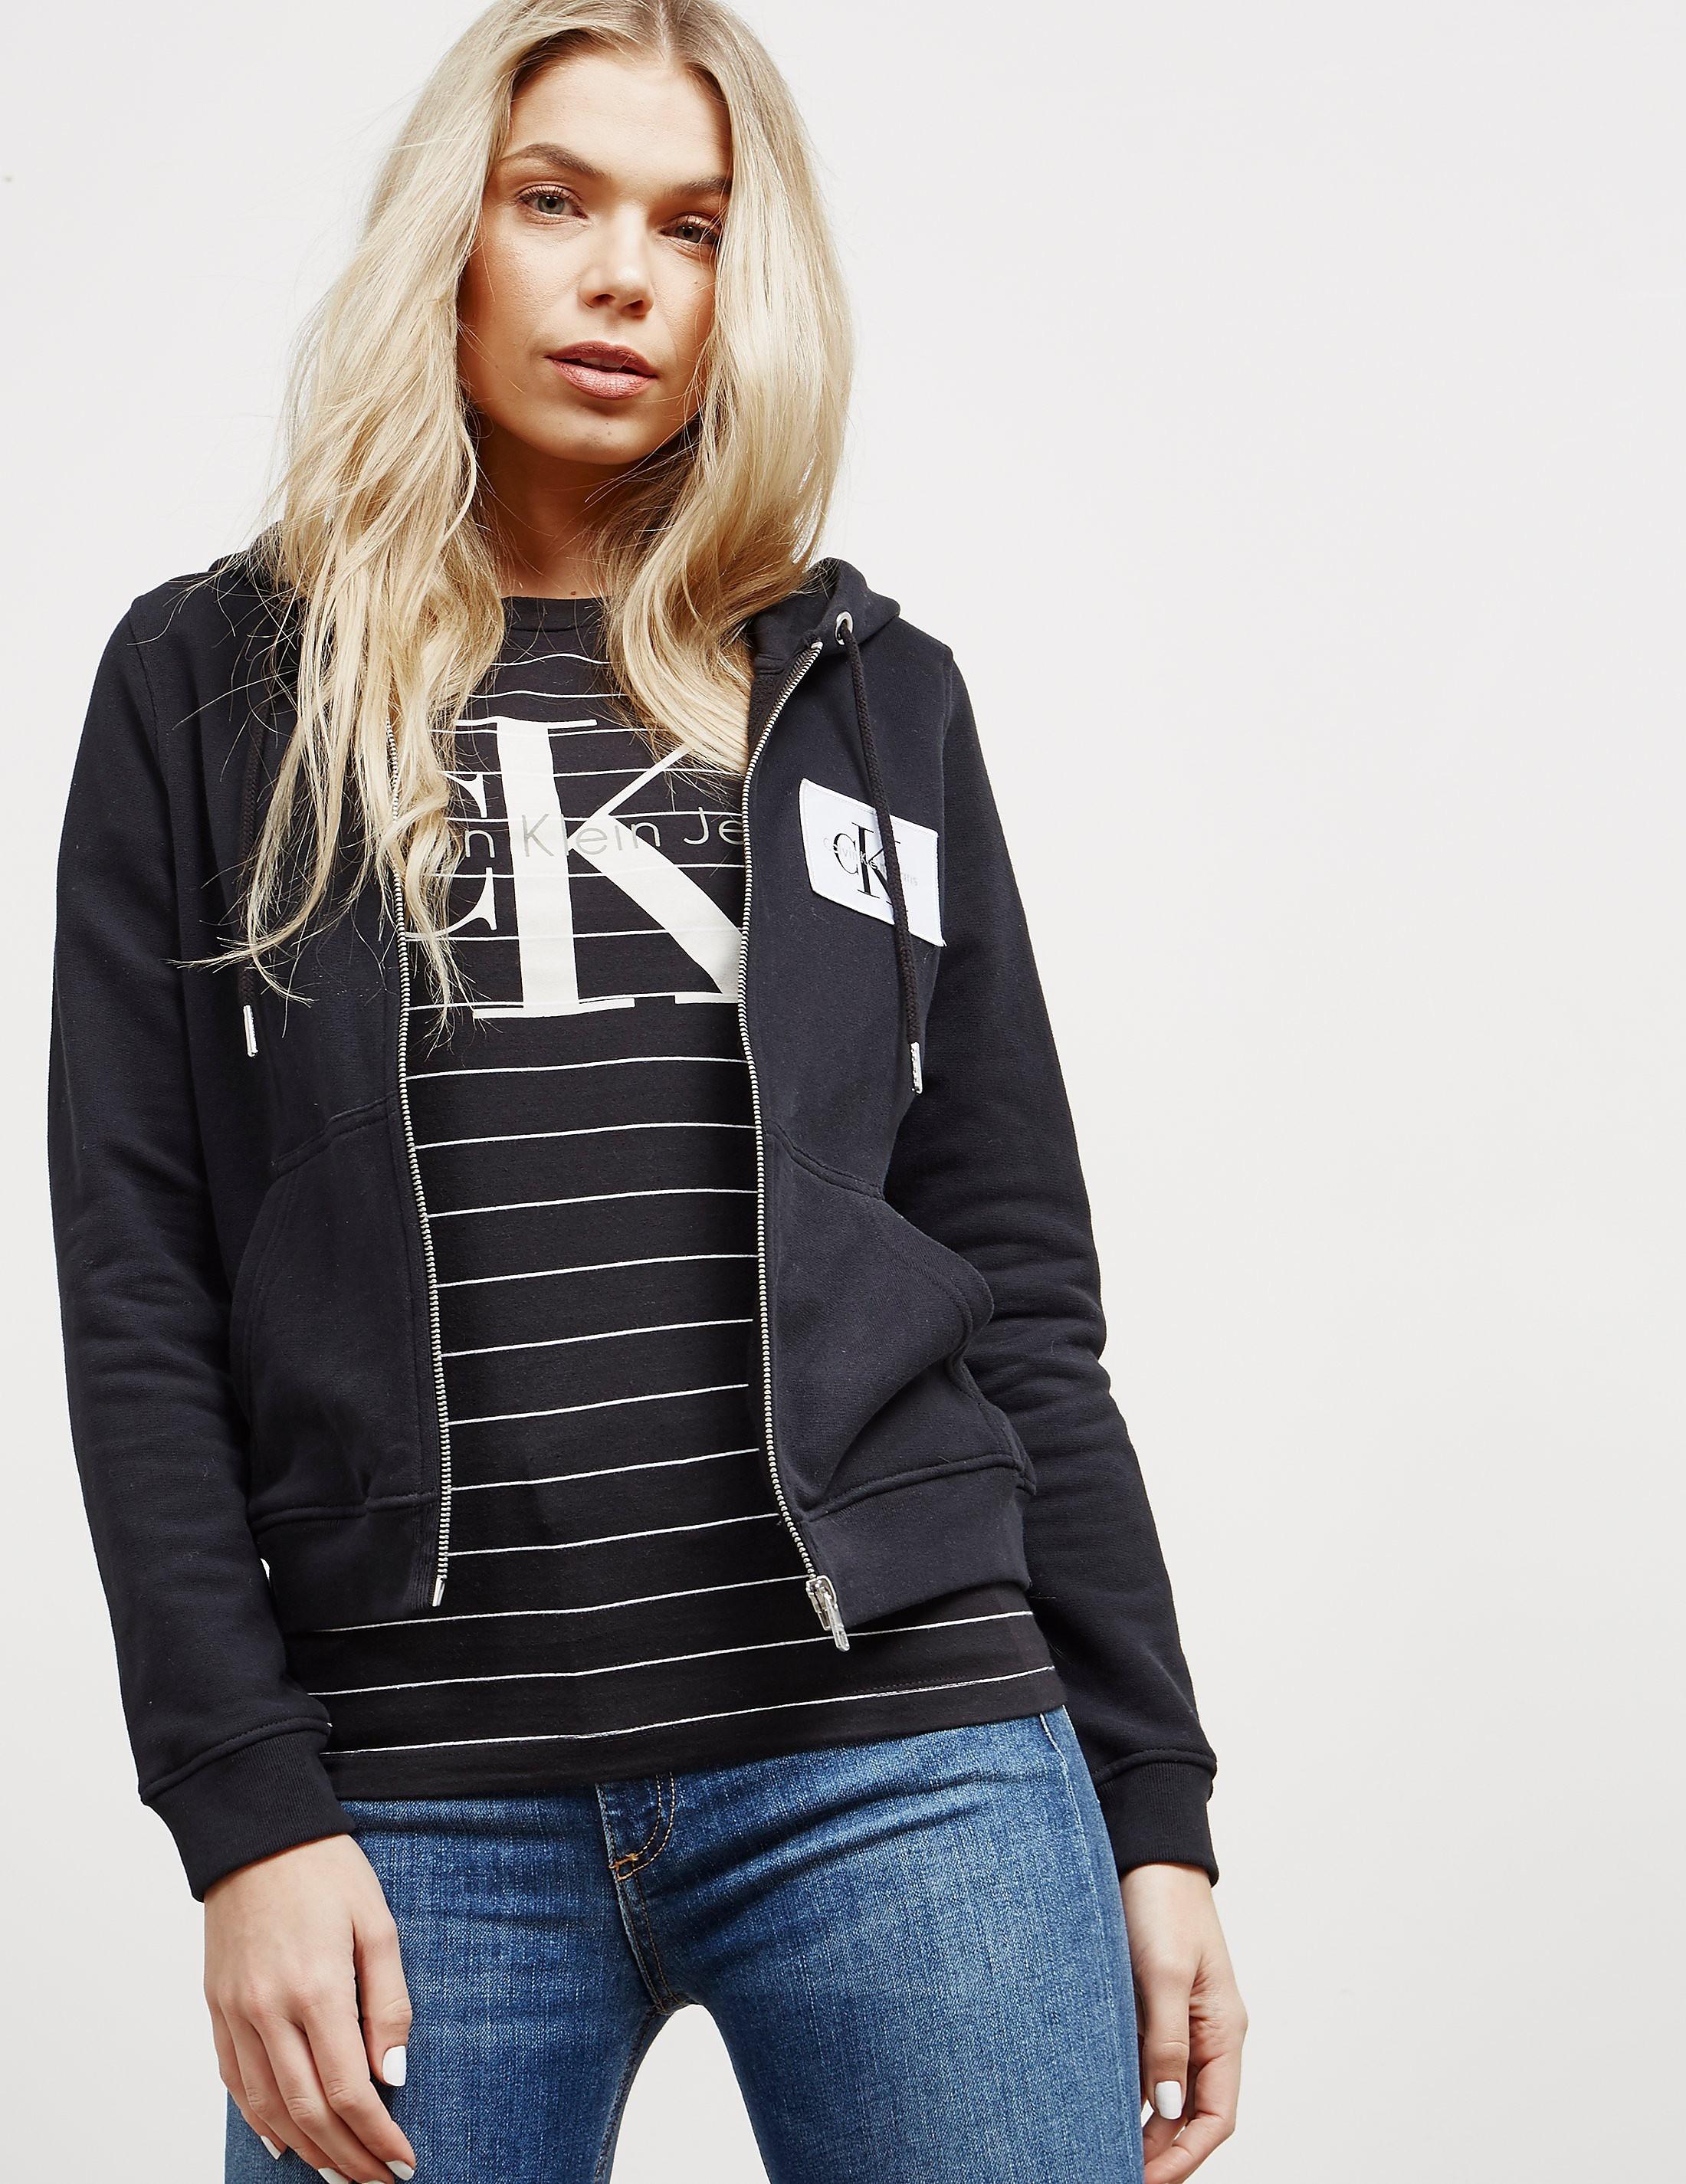 Calvin Klein True Icon Full Zip Hoodie